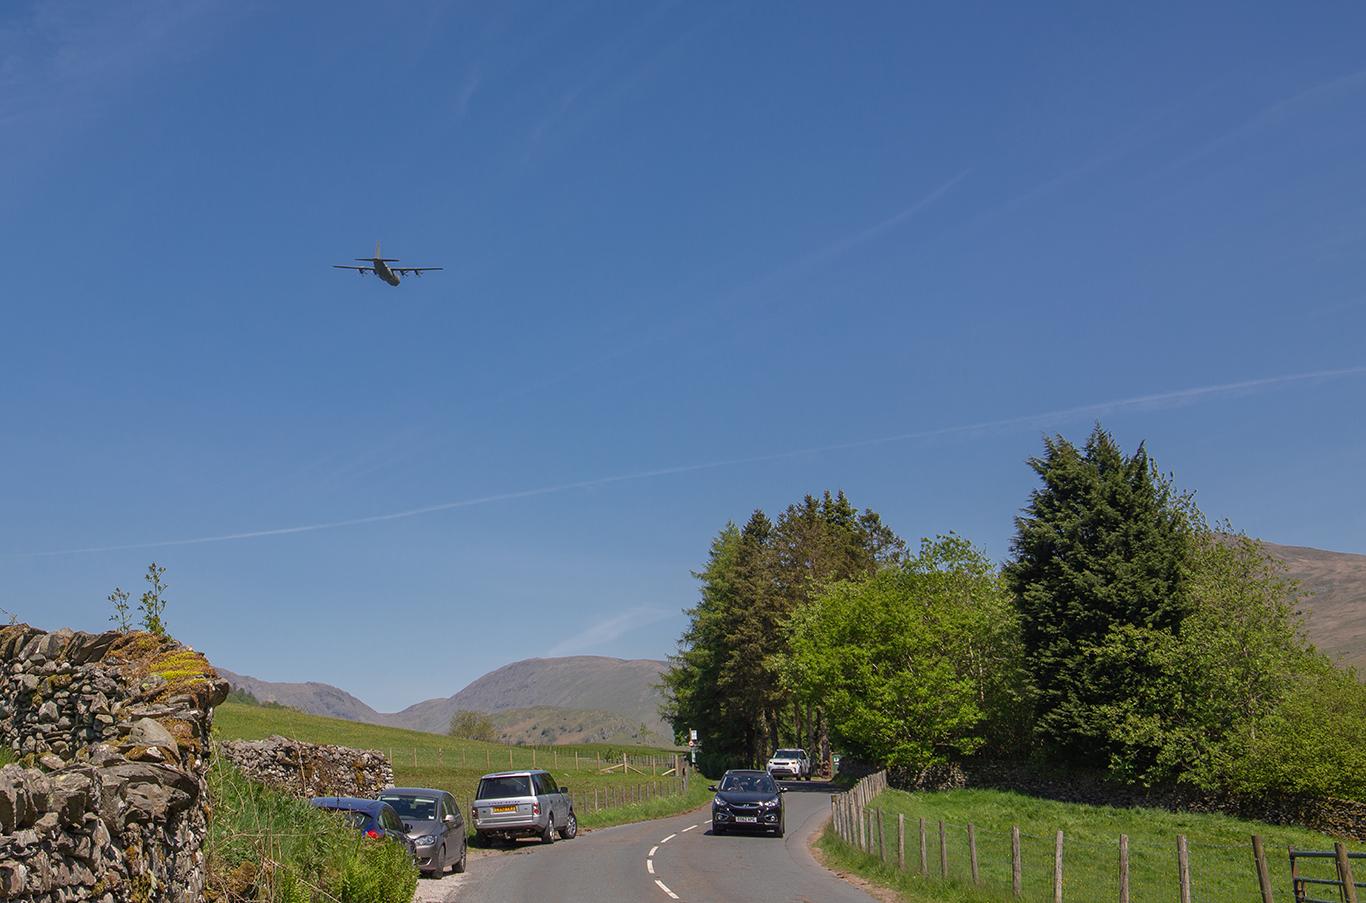 Hercules flying over Kirkstone Pass (1 of 1)